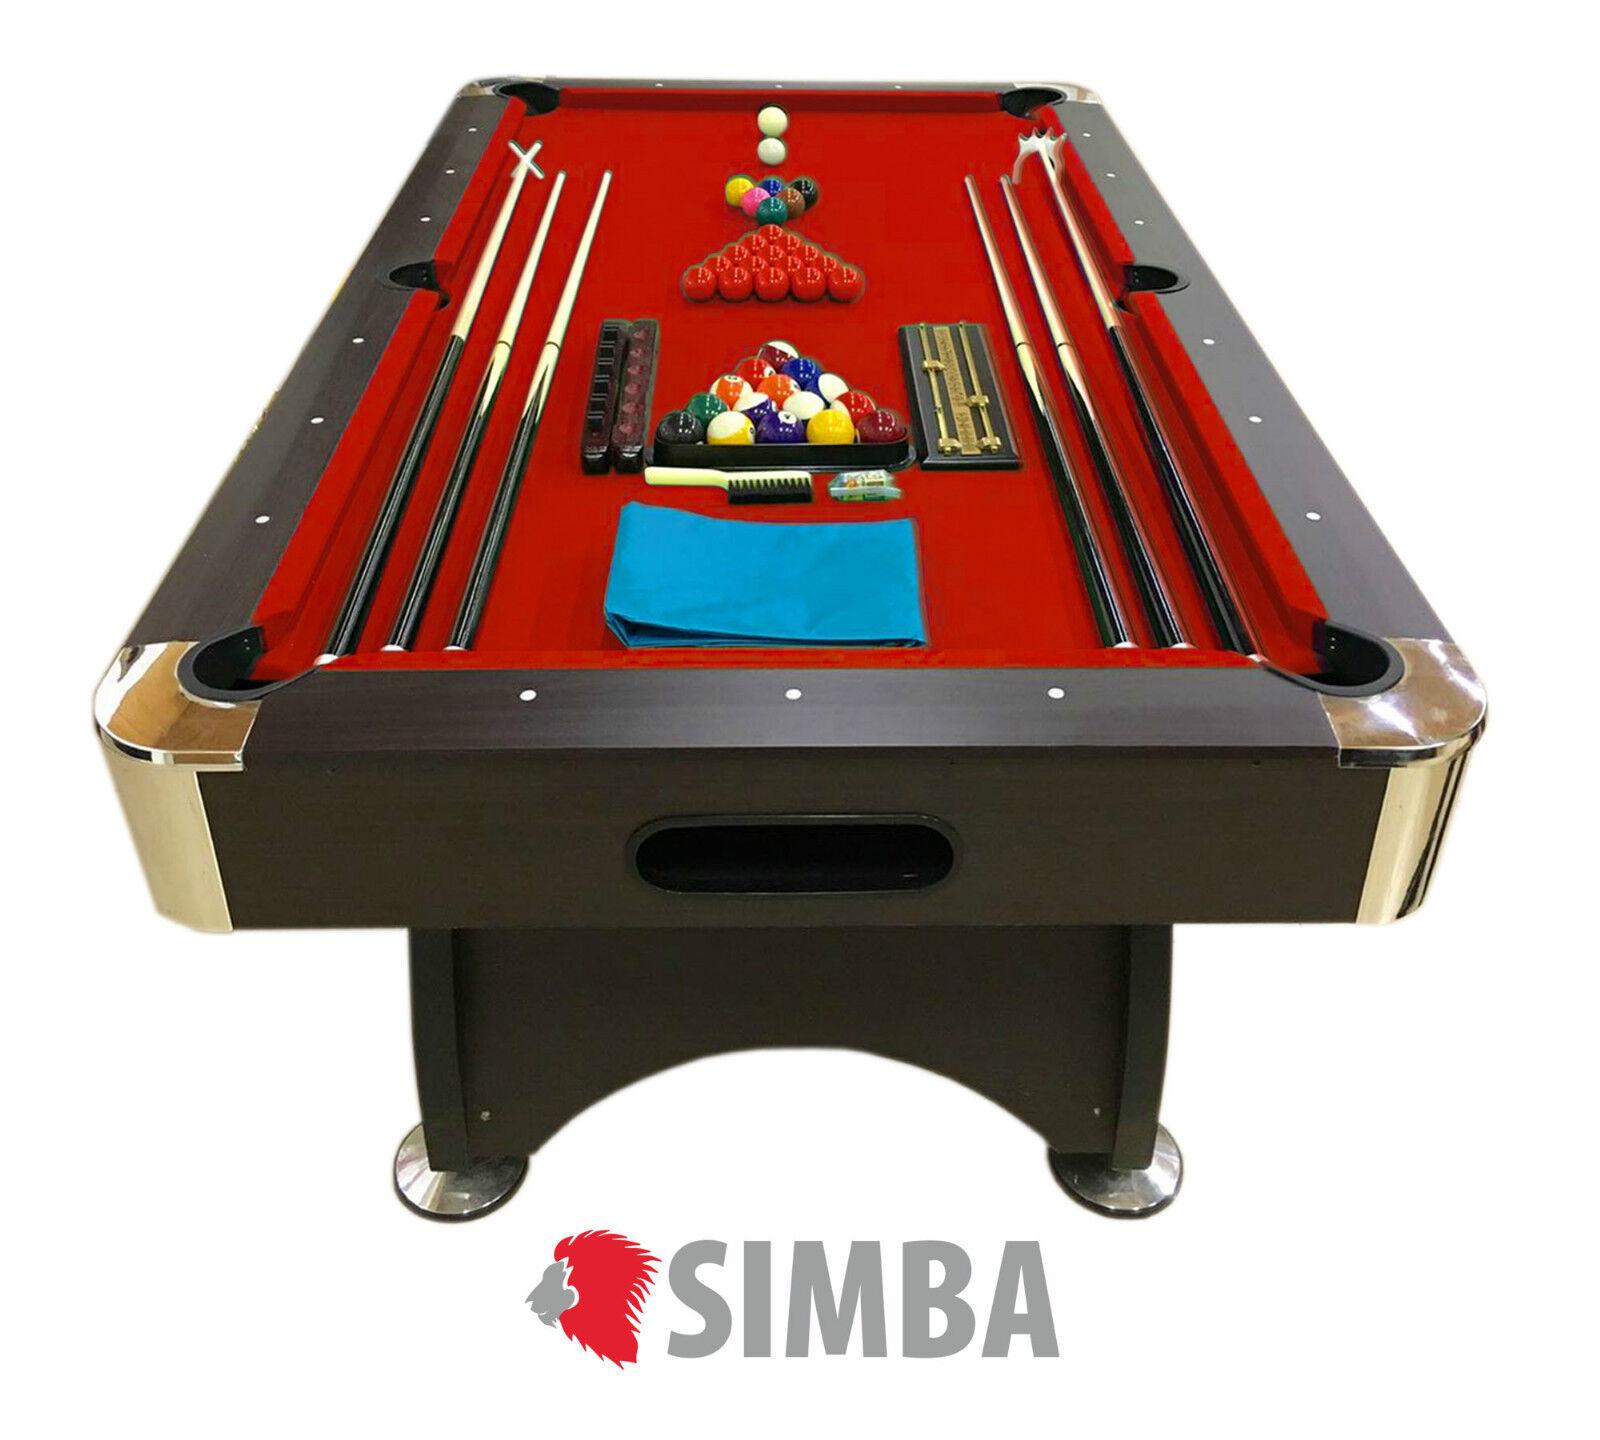 Mesa de billar pool 7 ft carambola juegos de billar Mod. rosso Devil FULL